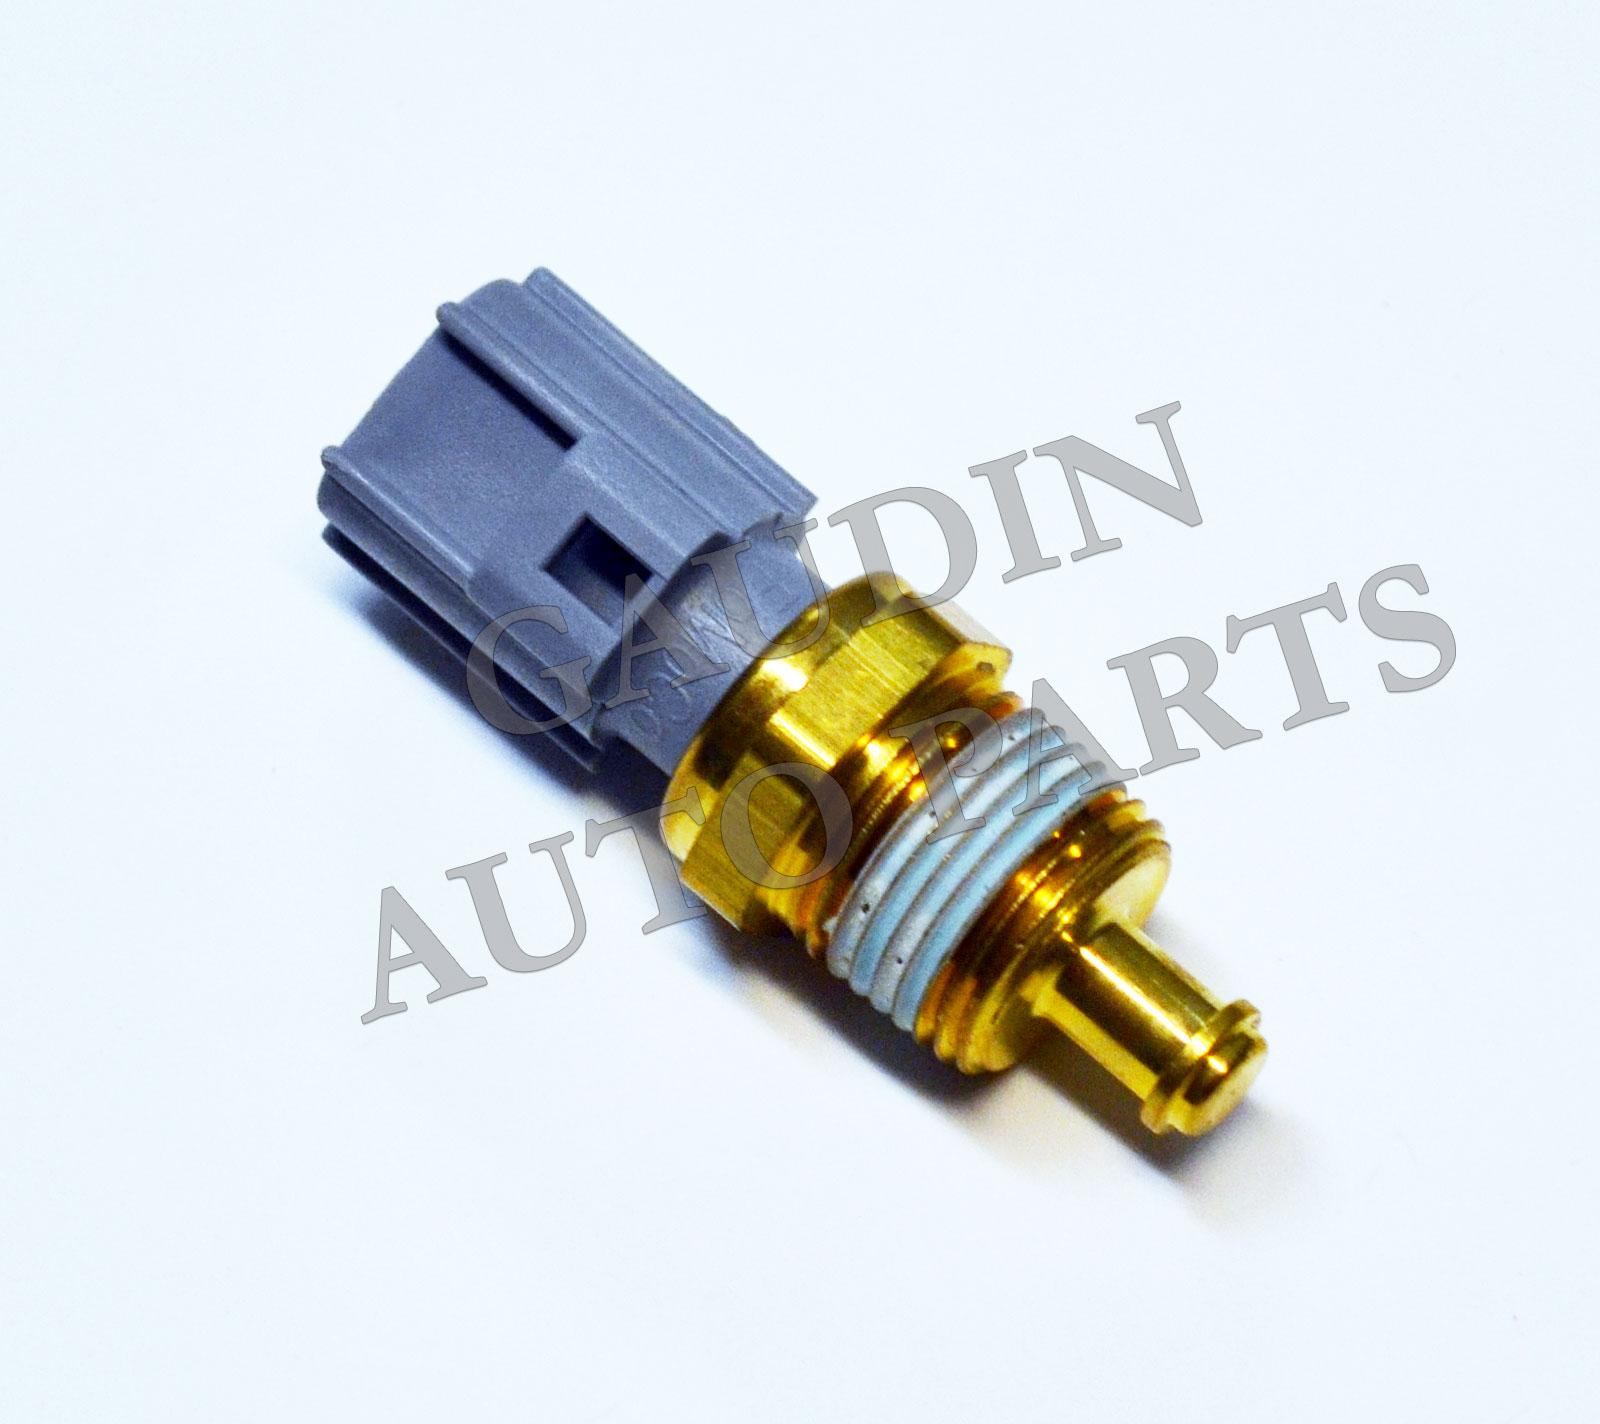 Coolant Sensor Question: FORD OEM-Radiator Coolant Temperature Sensor 3F1Z12A648A